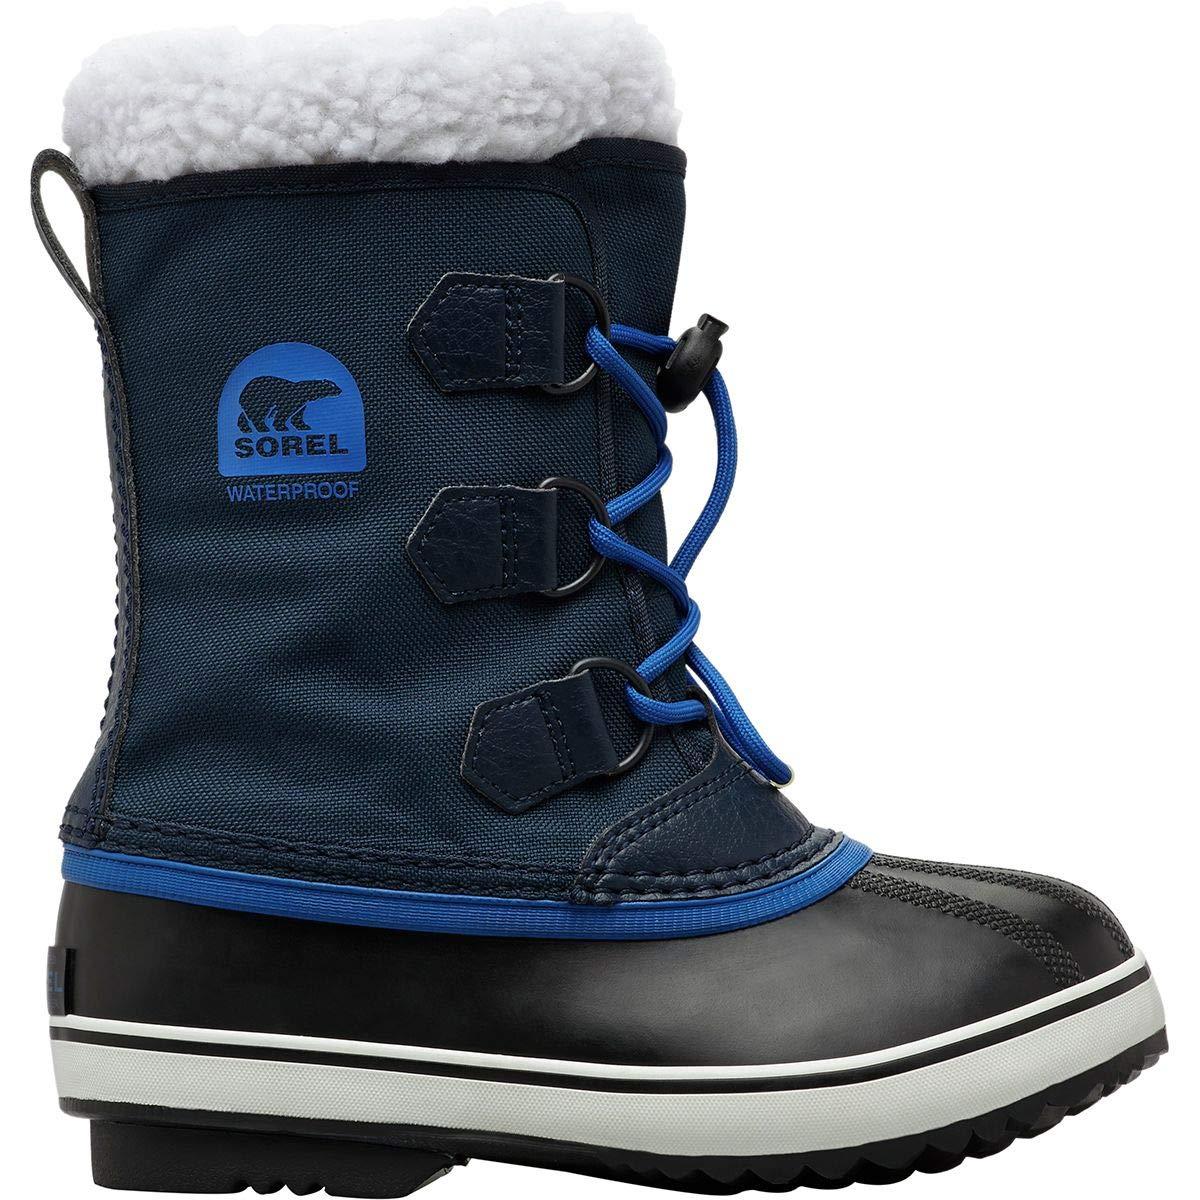 Sorel Marine Kinder Yoot Pac Nylon Stiefel Marine Sorel e62b8f